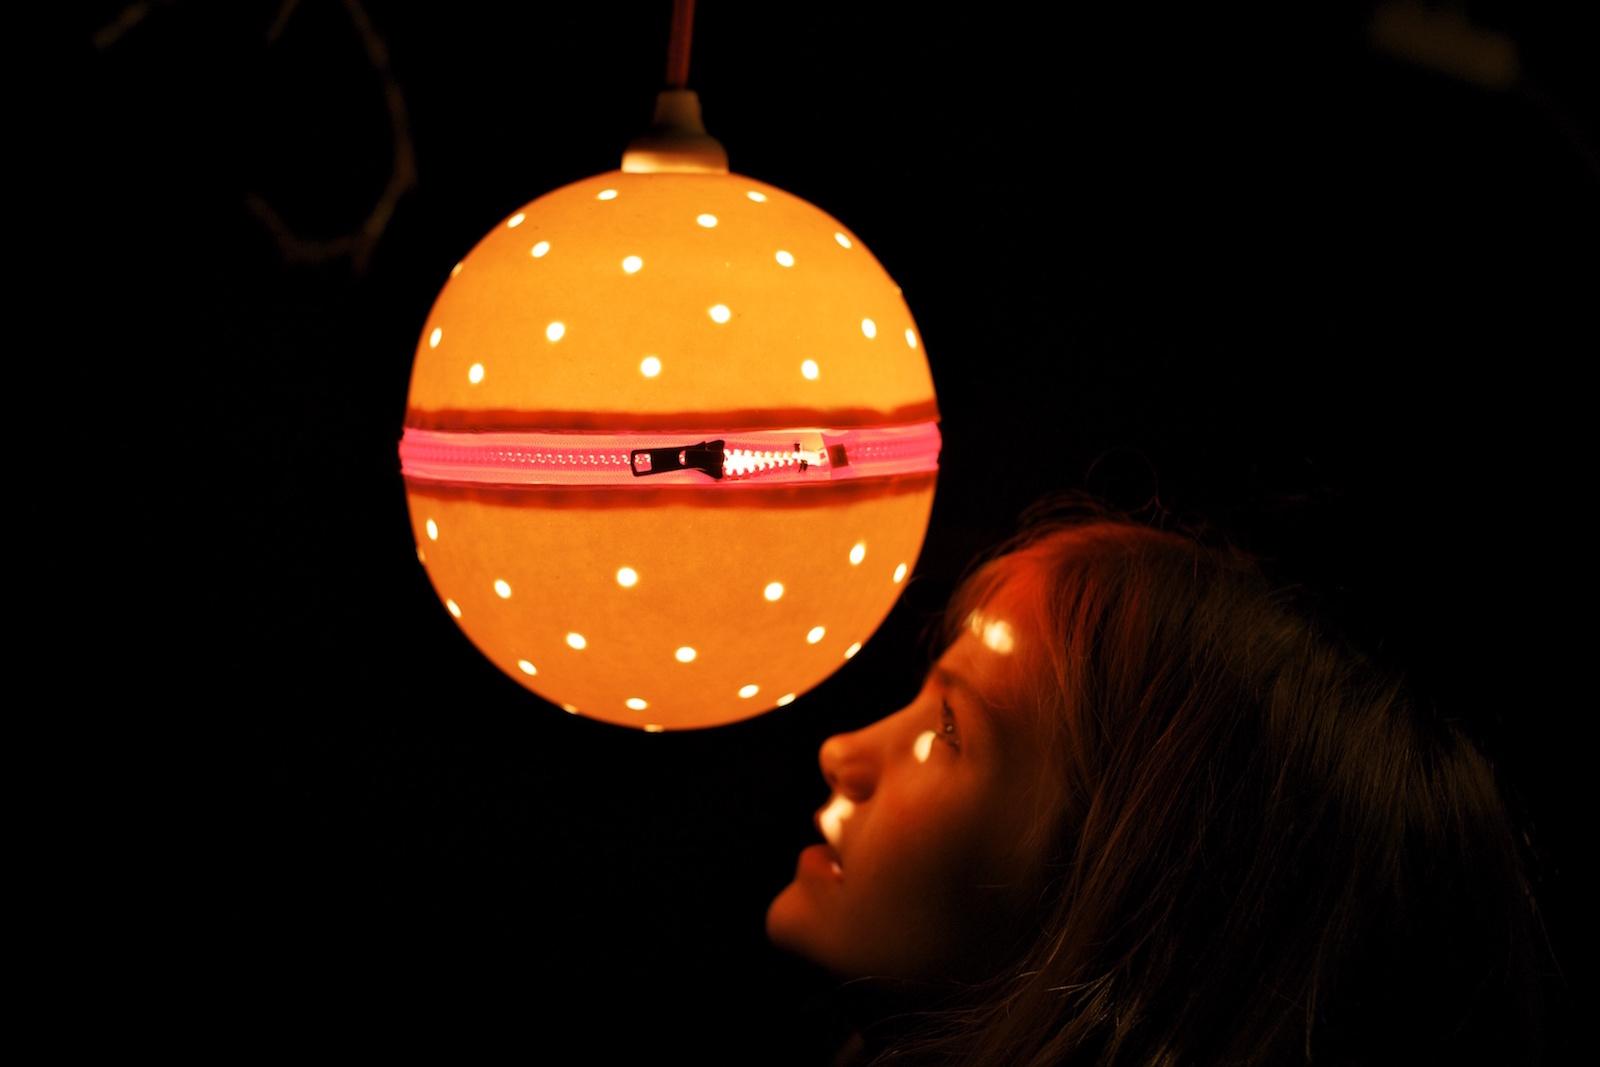 Lit Zzip pendant lamp in dark room